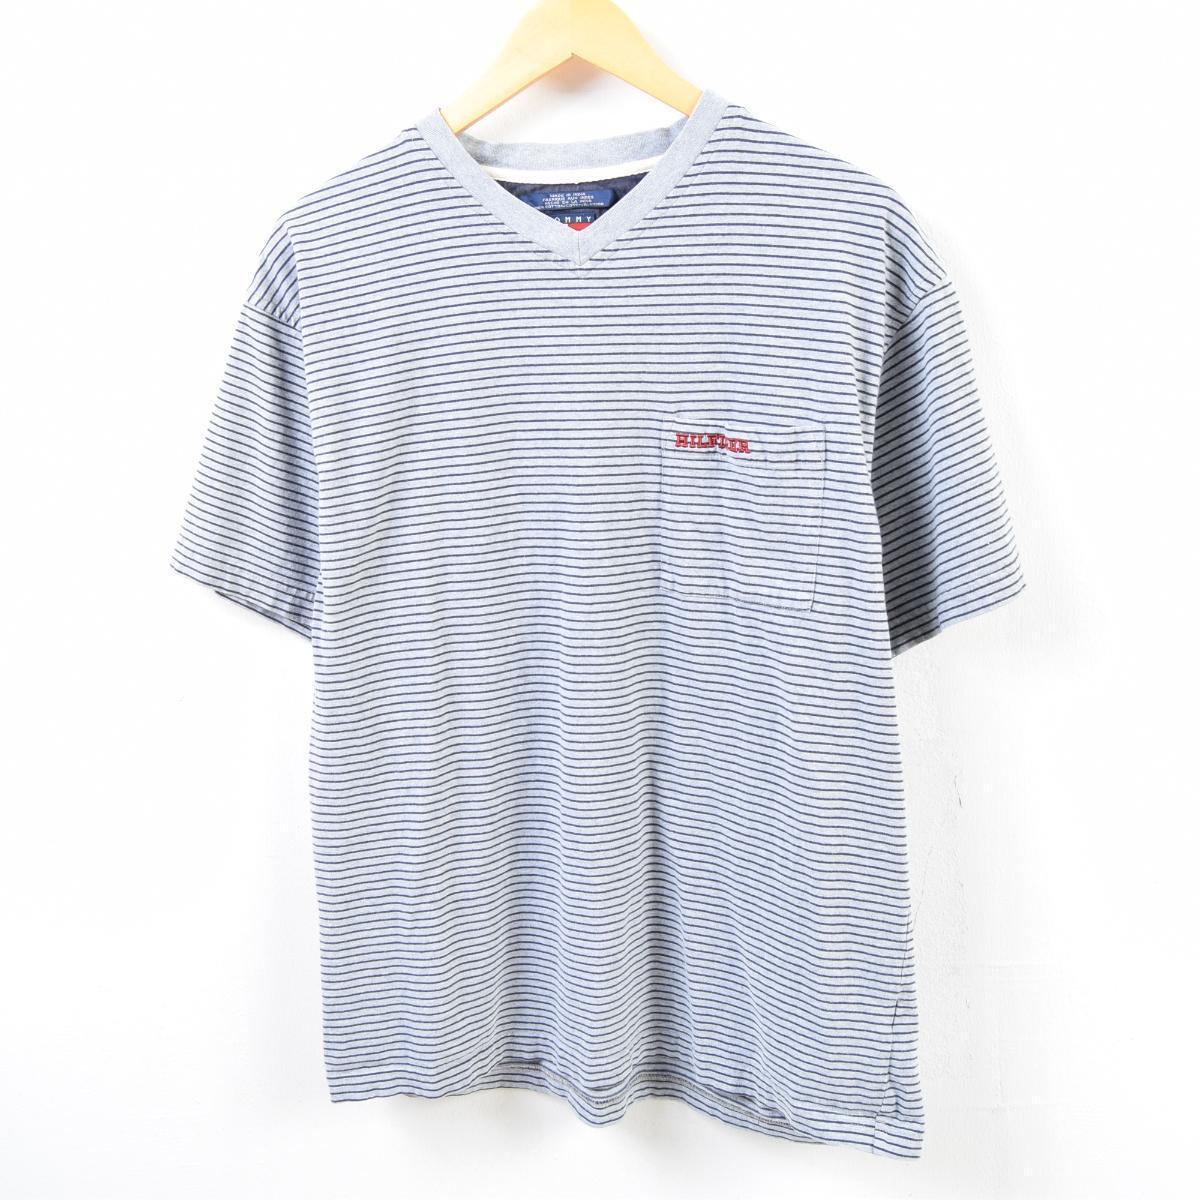 660dc8691c 90s トミーヒルフィガー TOMMY HILFIGER horizontal stripes V neck one point logo  pocket T-shirt men L /wbb5862